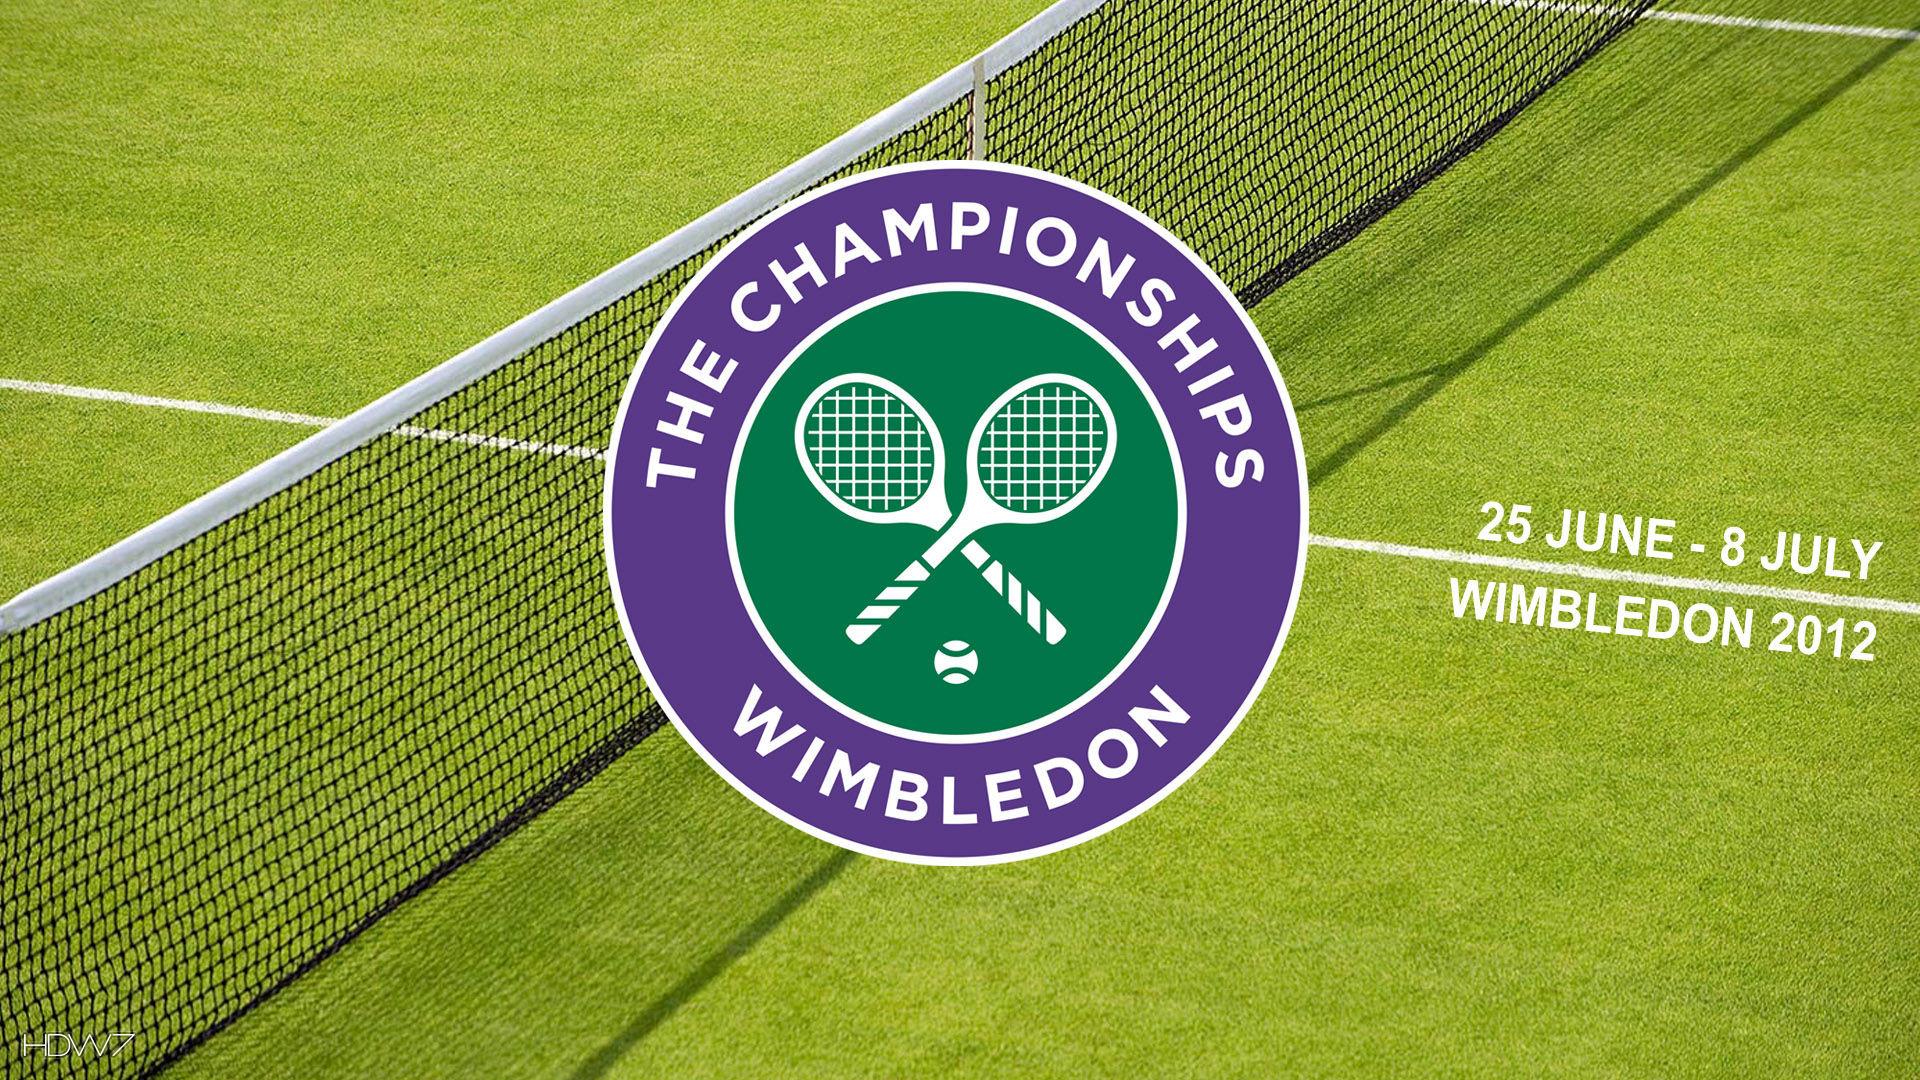 Tennis Sfondi HD (61+ Immagini